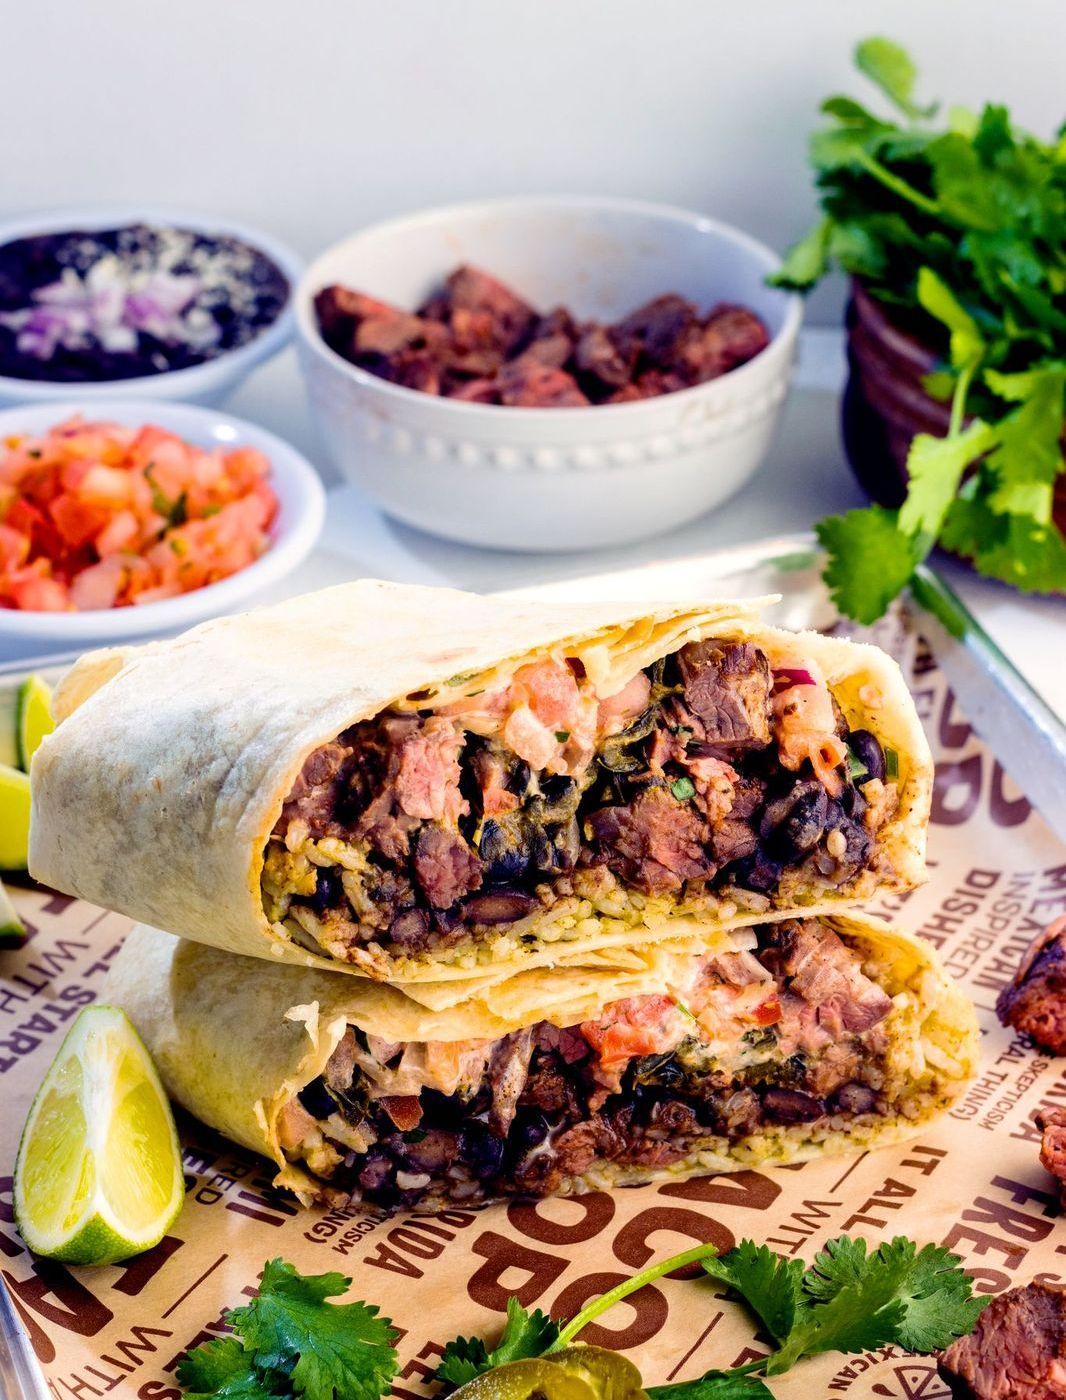 LIME Fresh Mexican Grill Carne Asada burrito